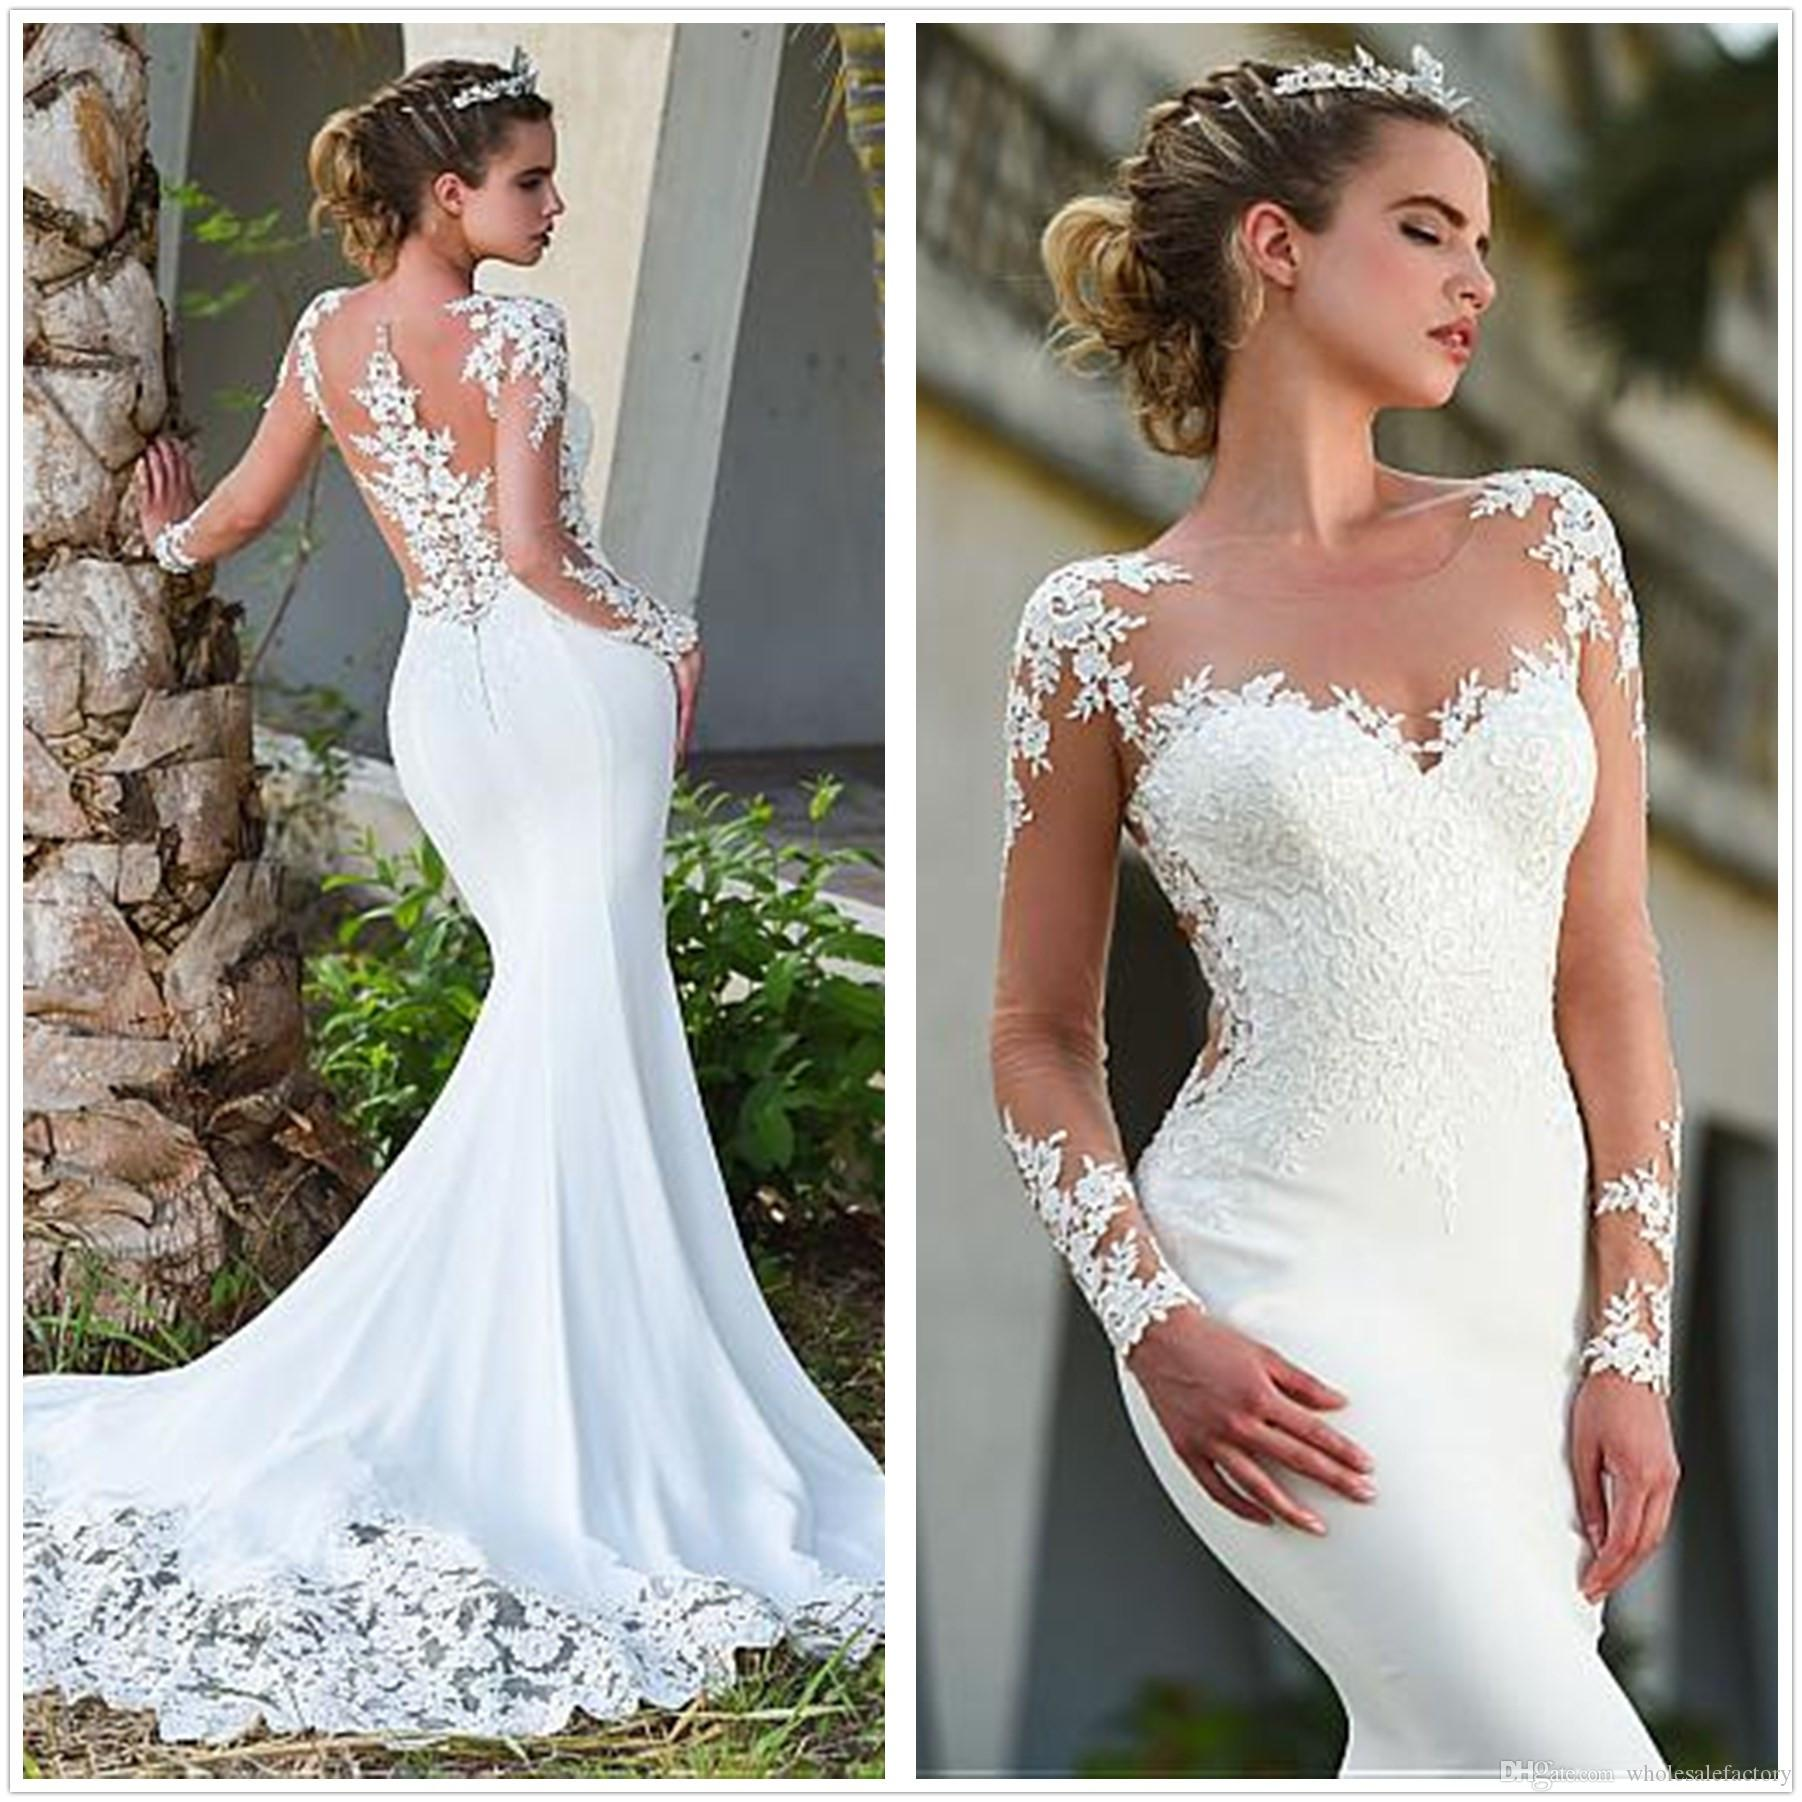 Sheer Lace Long Sleeve Satin Mermaid Wedding Dresses: Sheer Long Sleeves Satin Mermaid Wedding Dresses 2020